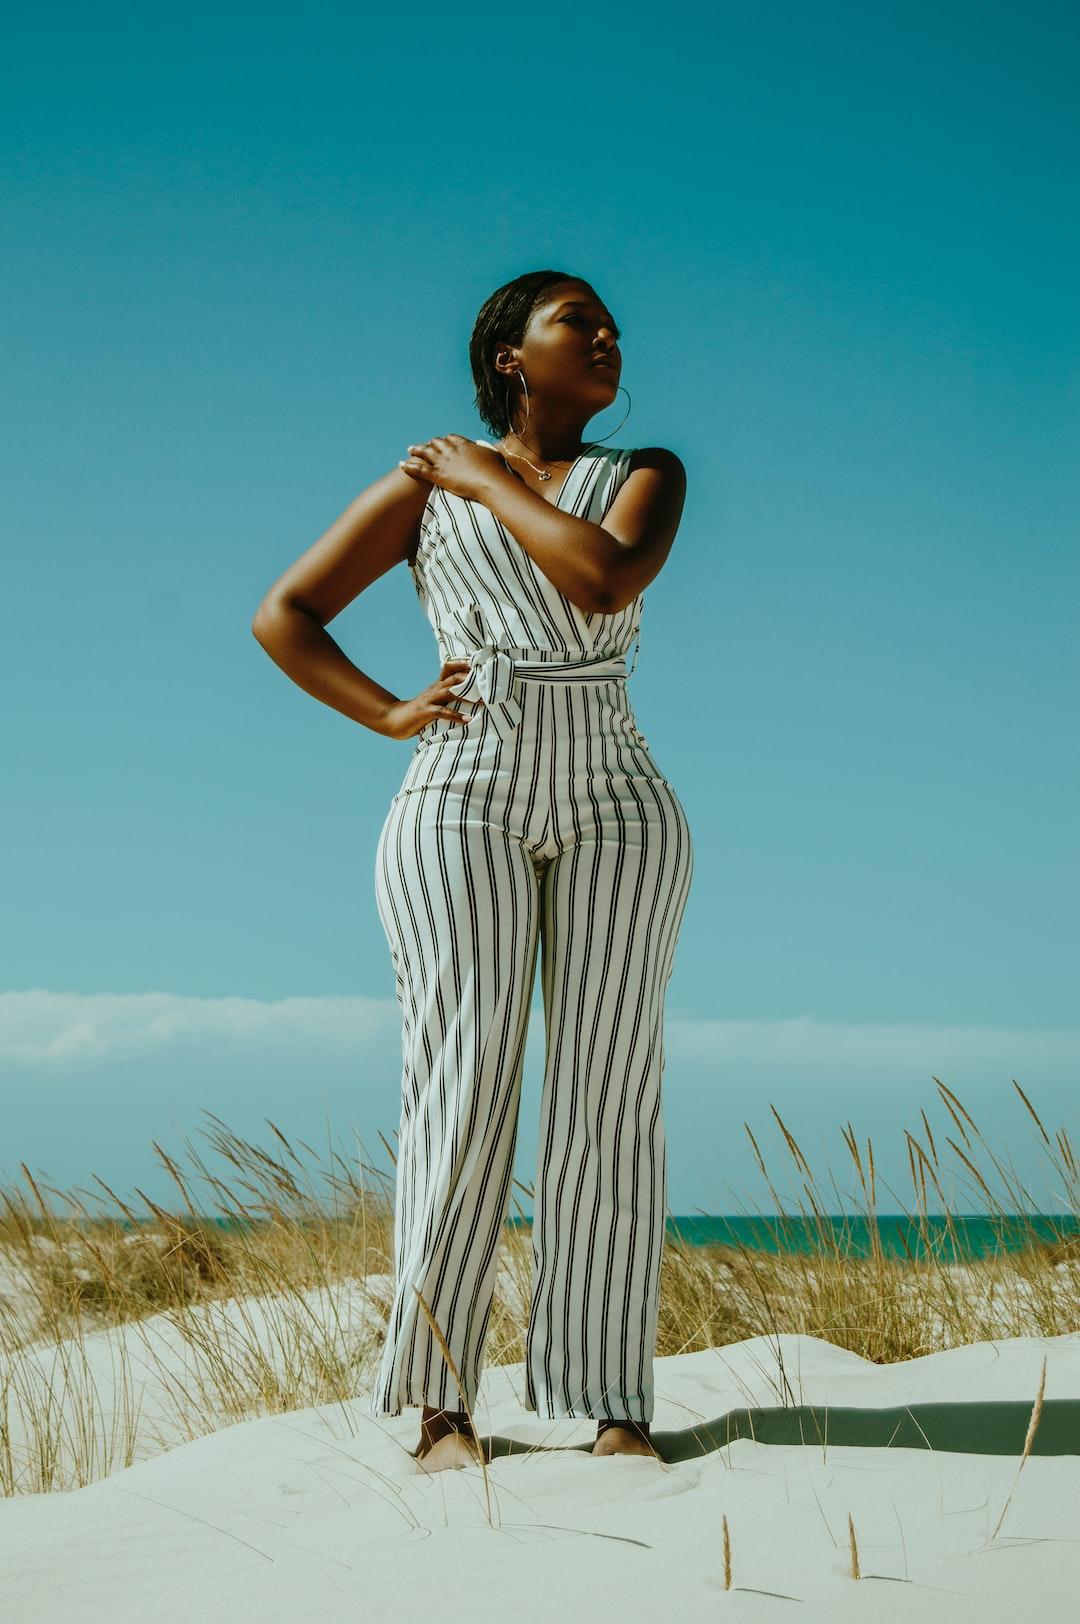 Beautiful summer Ebonics portrait of a gorgeous model taken near the beach